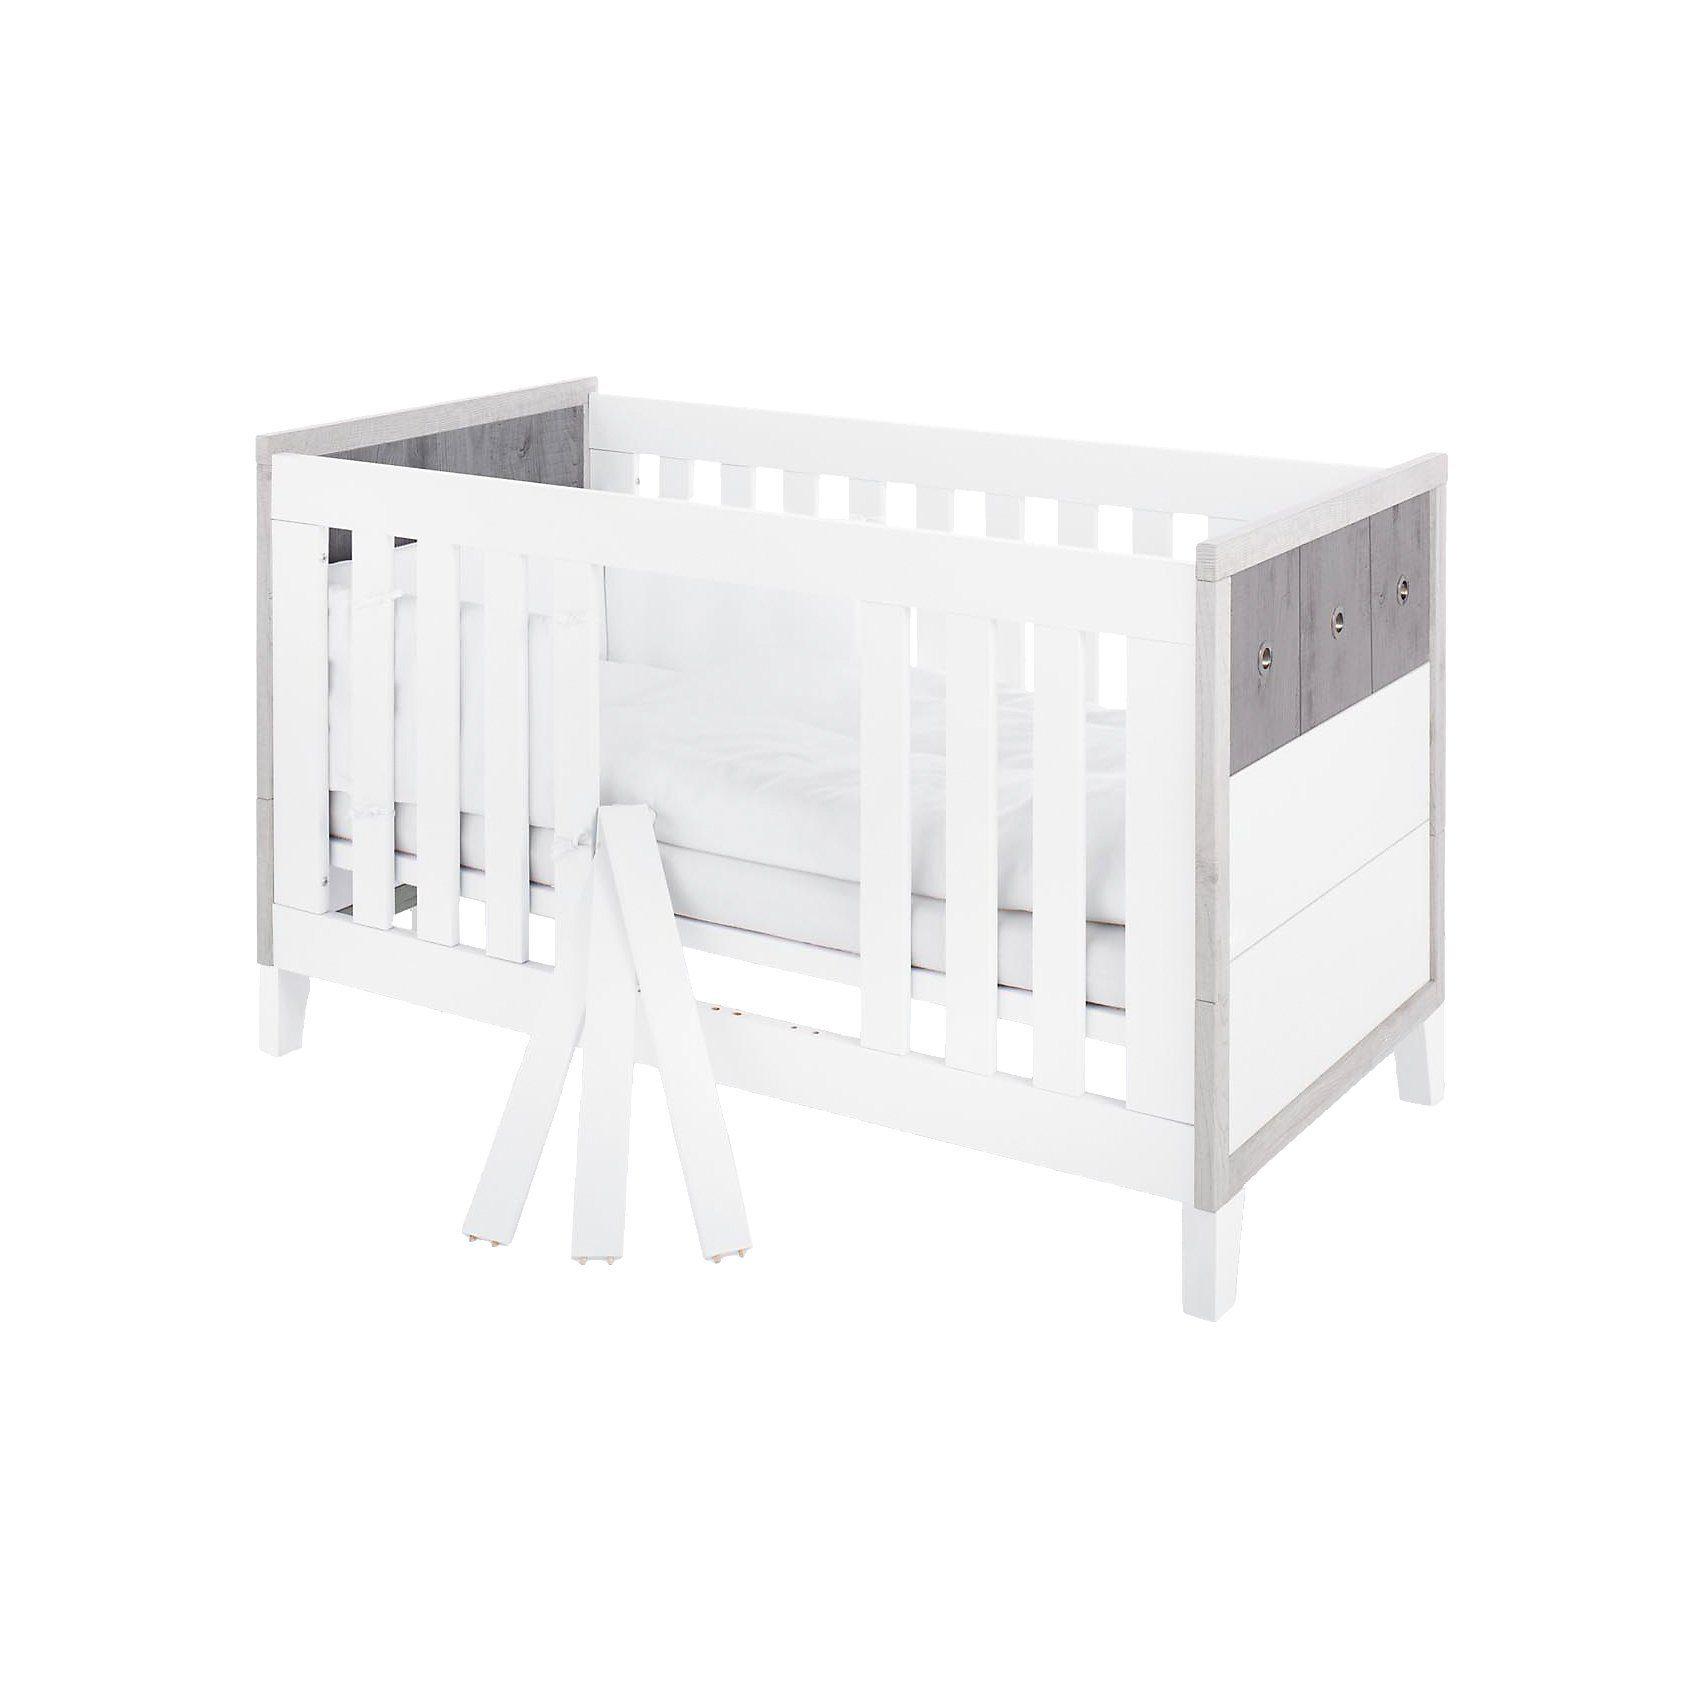 Pinolino Kinderbett HARPER, MDF weiß/Eiche grau/Esche grau, 70 x 140